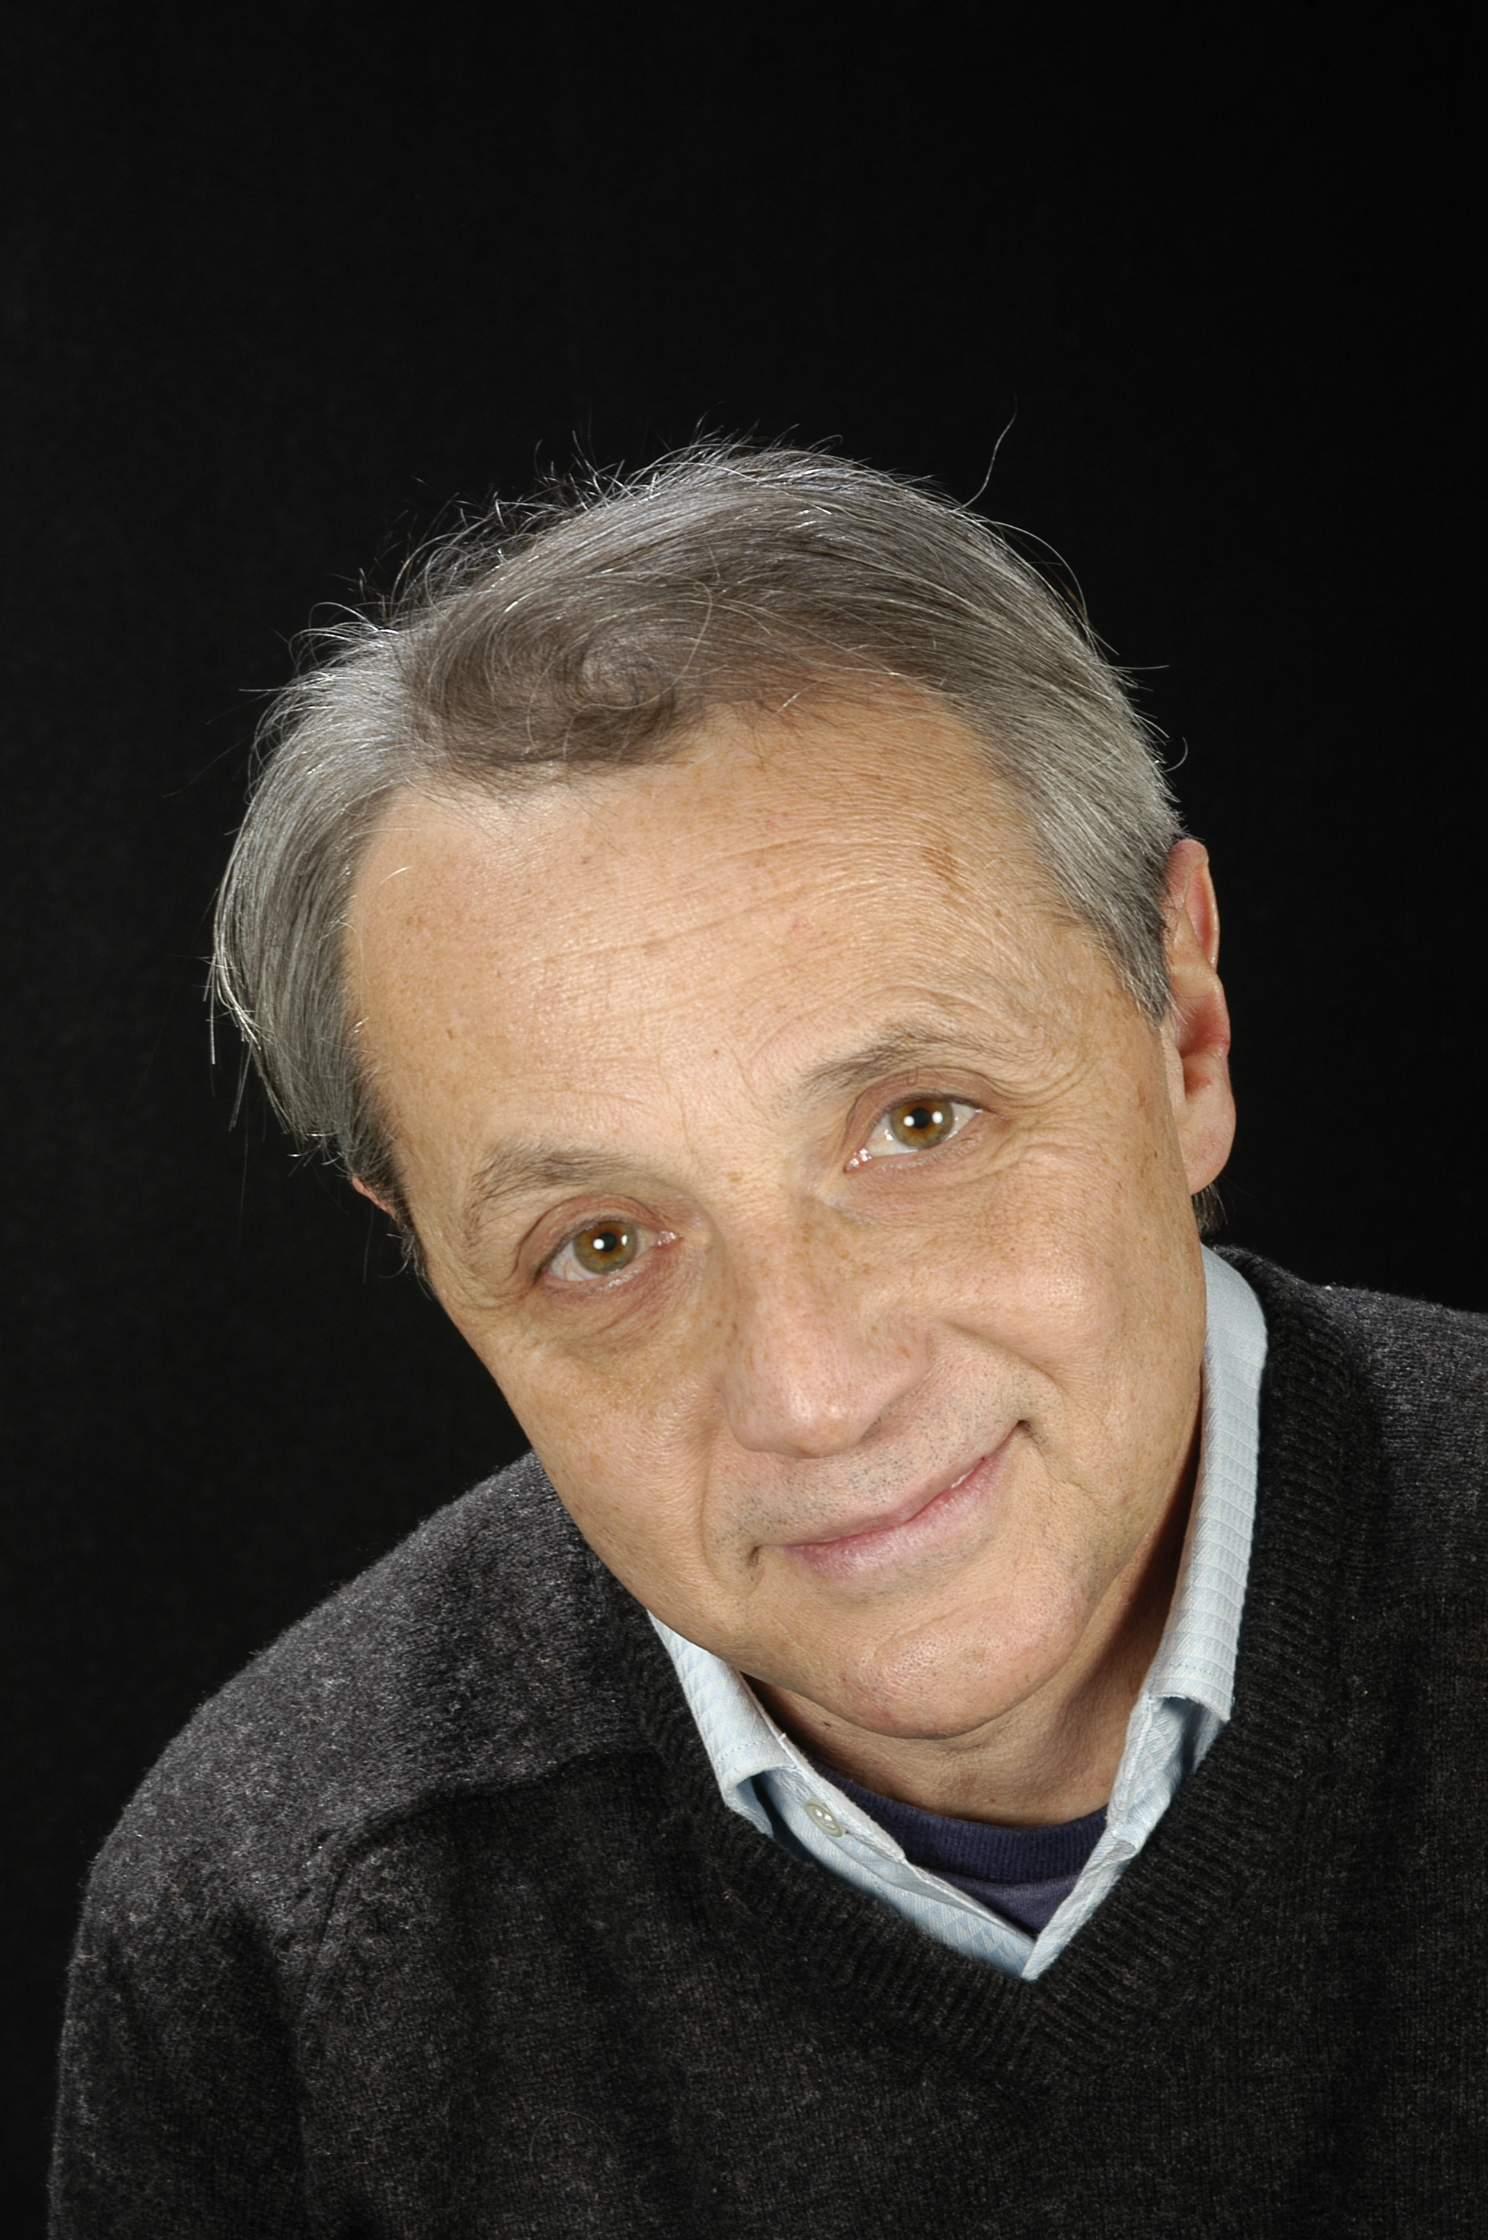 Sr. Carles J. Ciudad